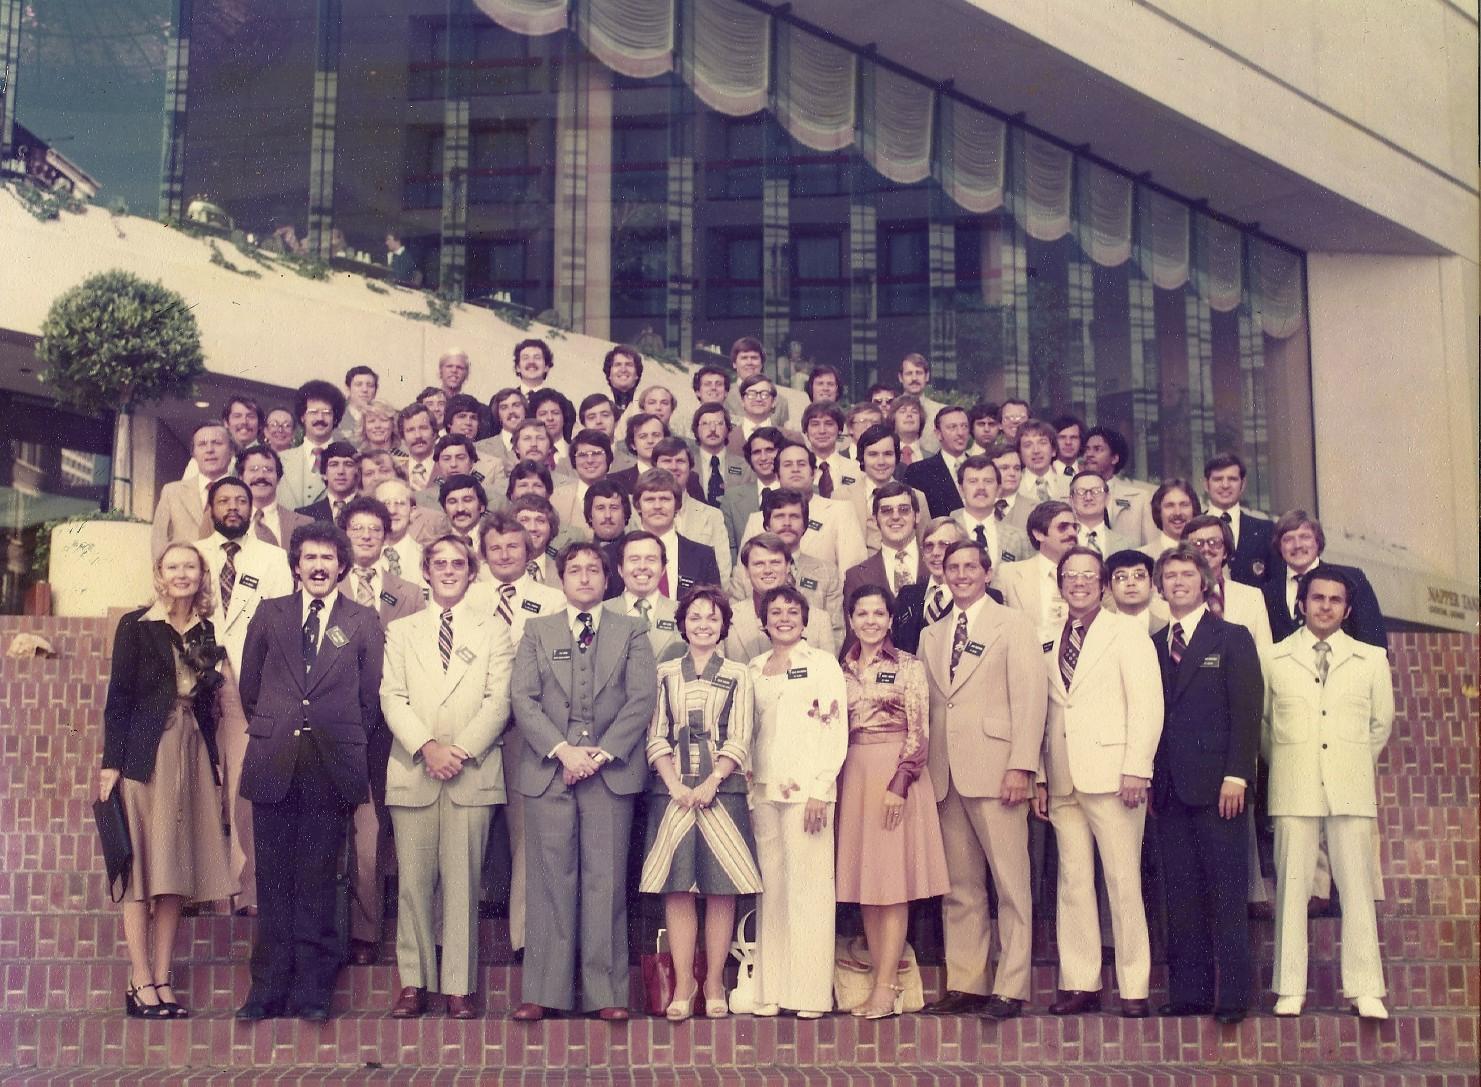 Richardson-Vicks National Meeting 1976.